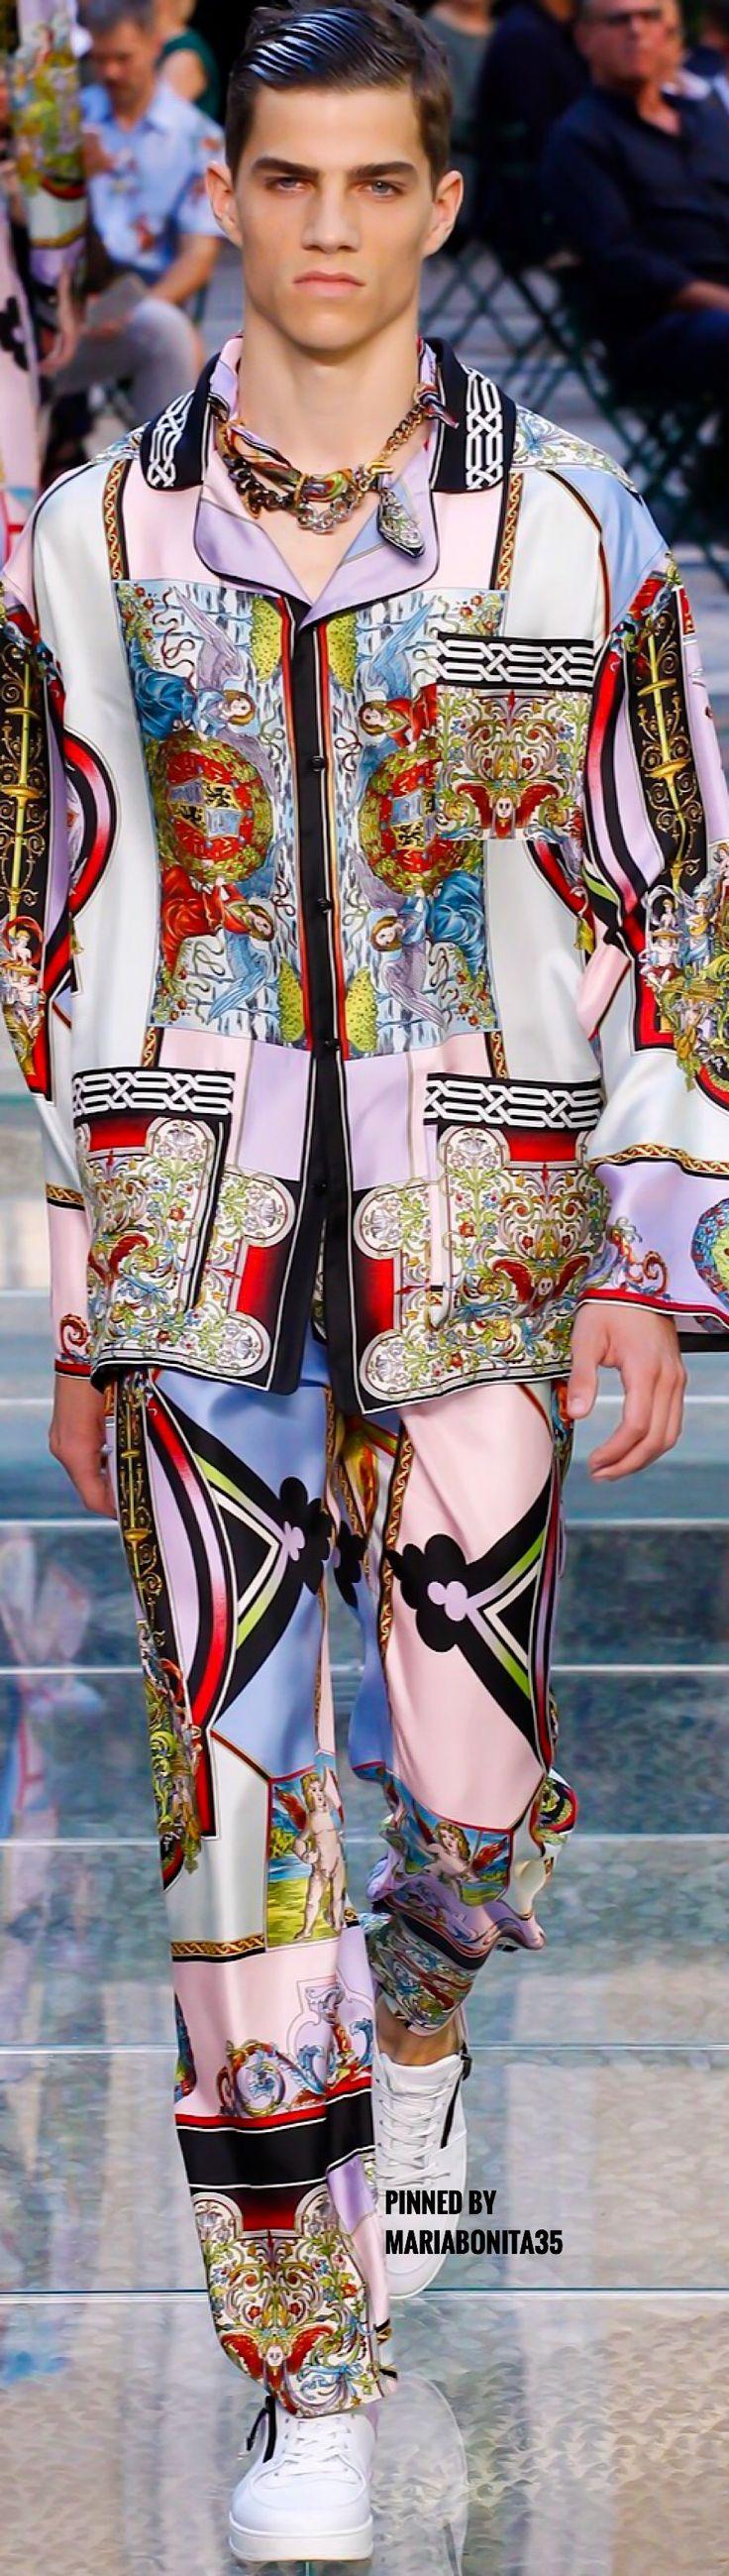 www.2locos.com  Versace SS18 Menswear